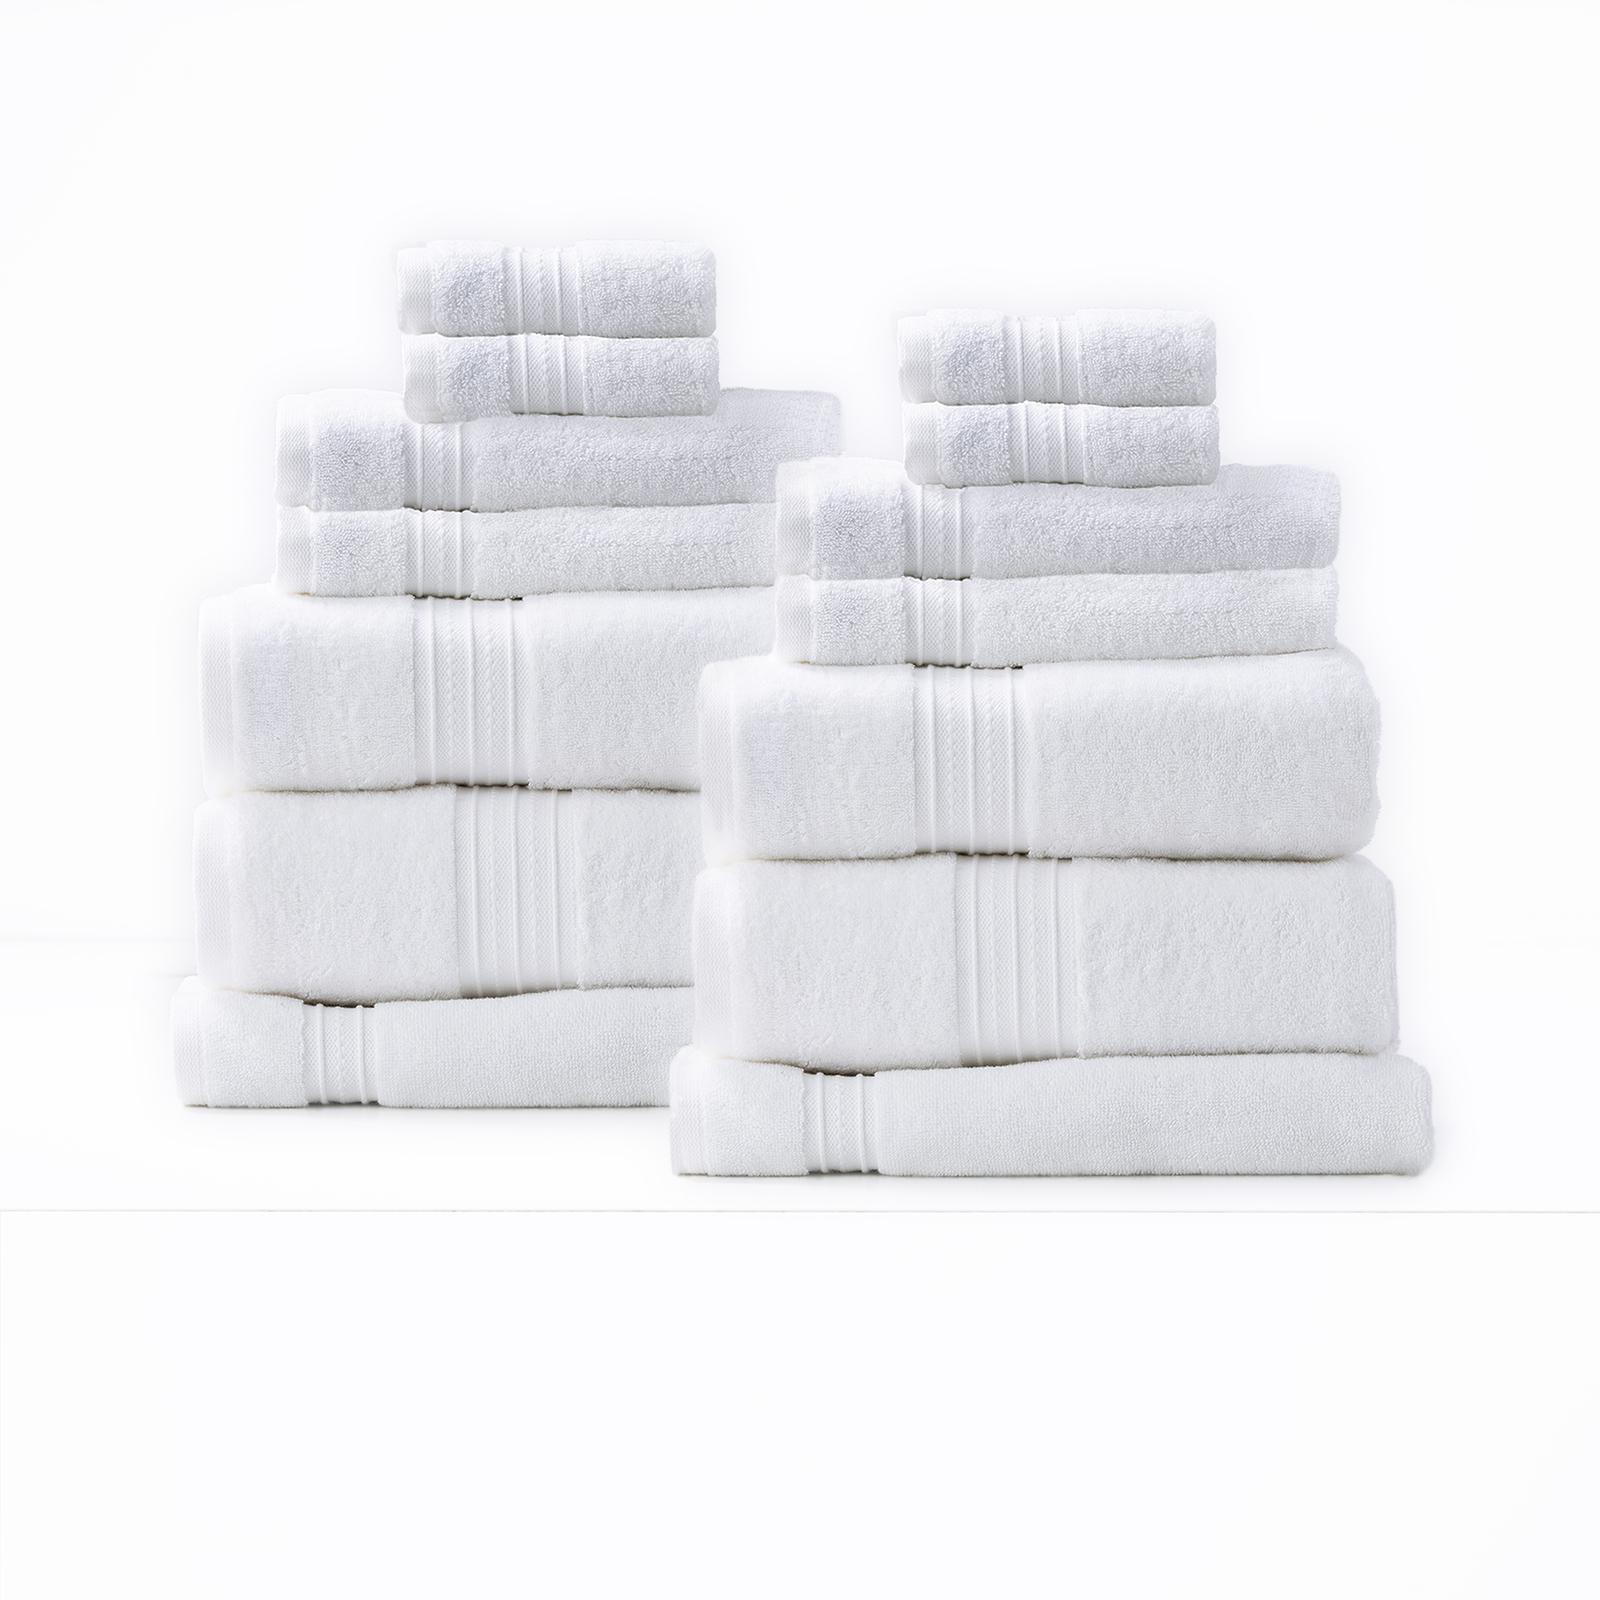 14 Piece Combed Cotton Zero Twist Towels 650 gsm | Bright White